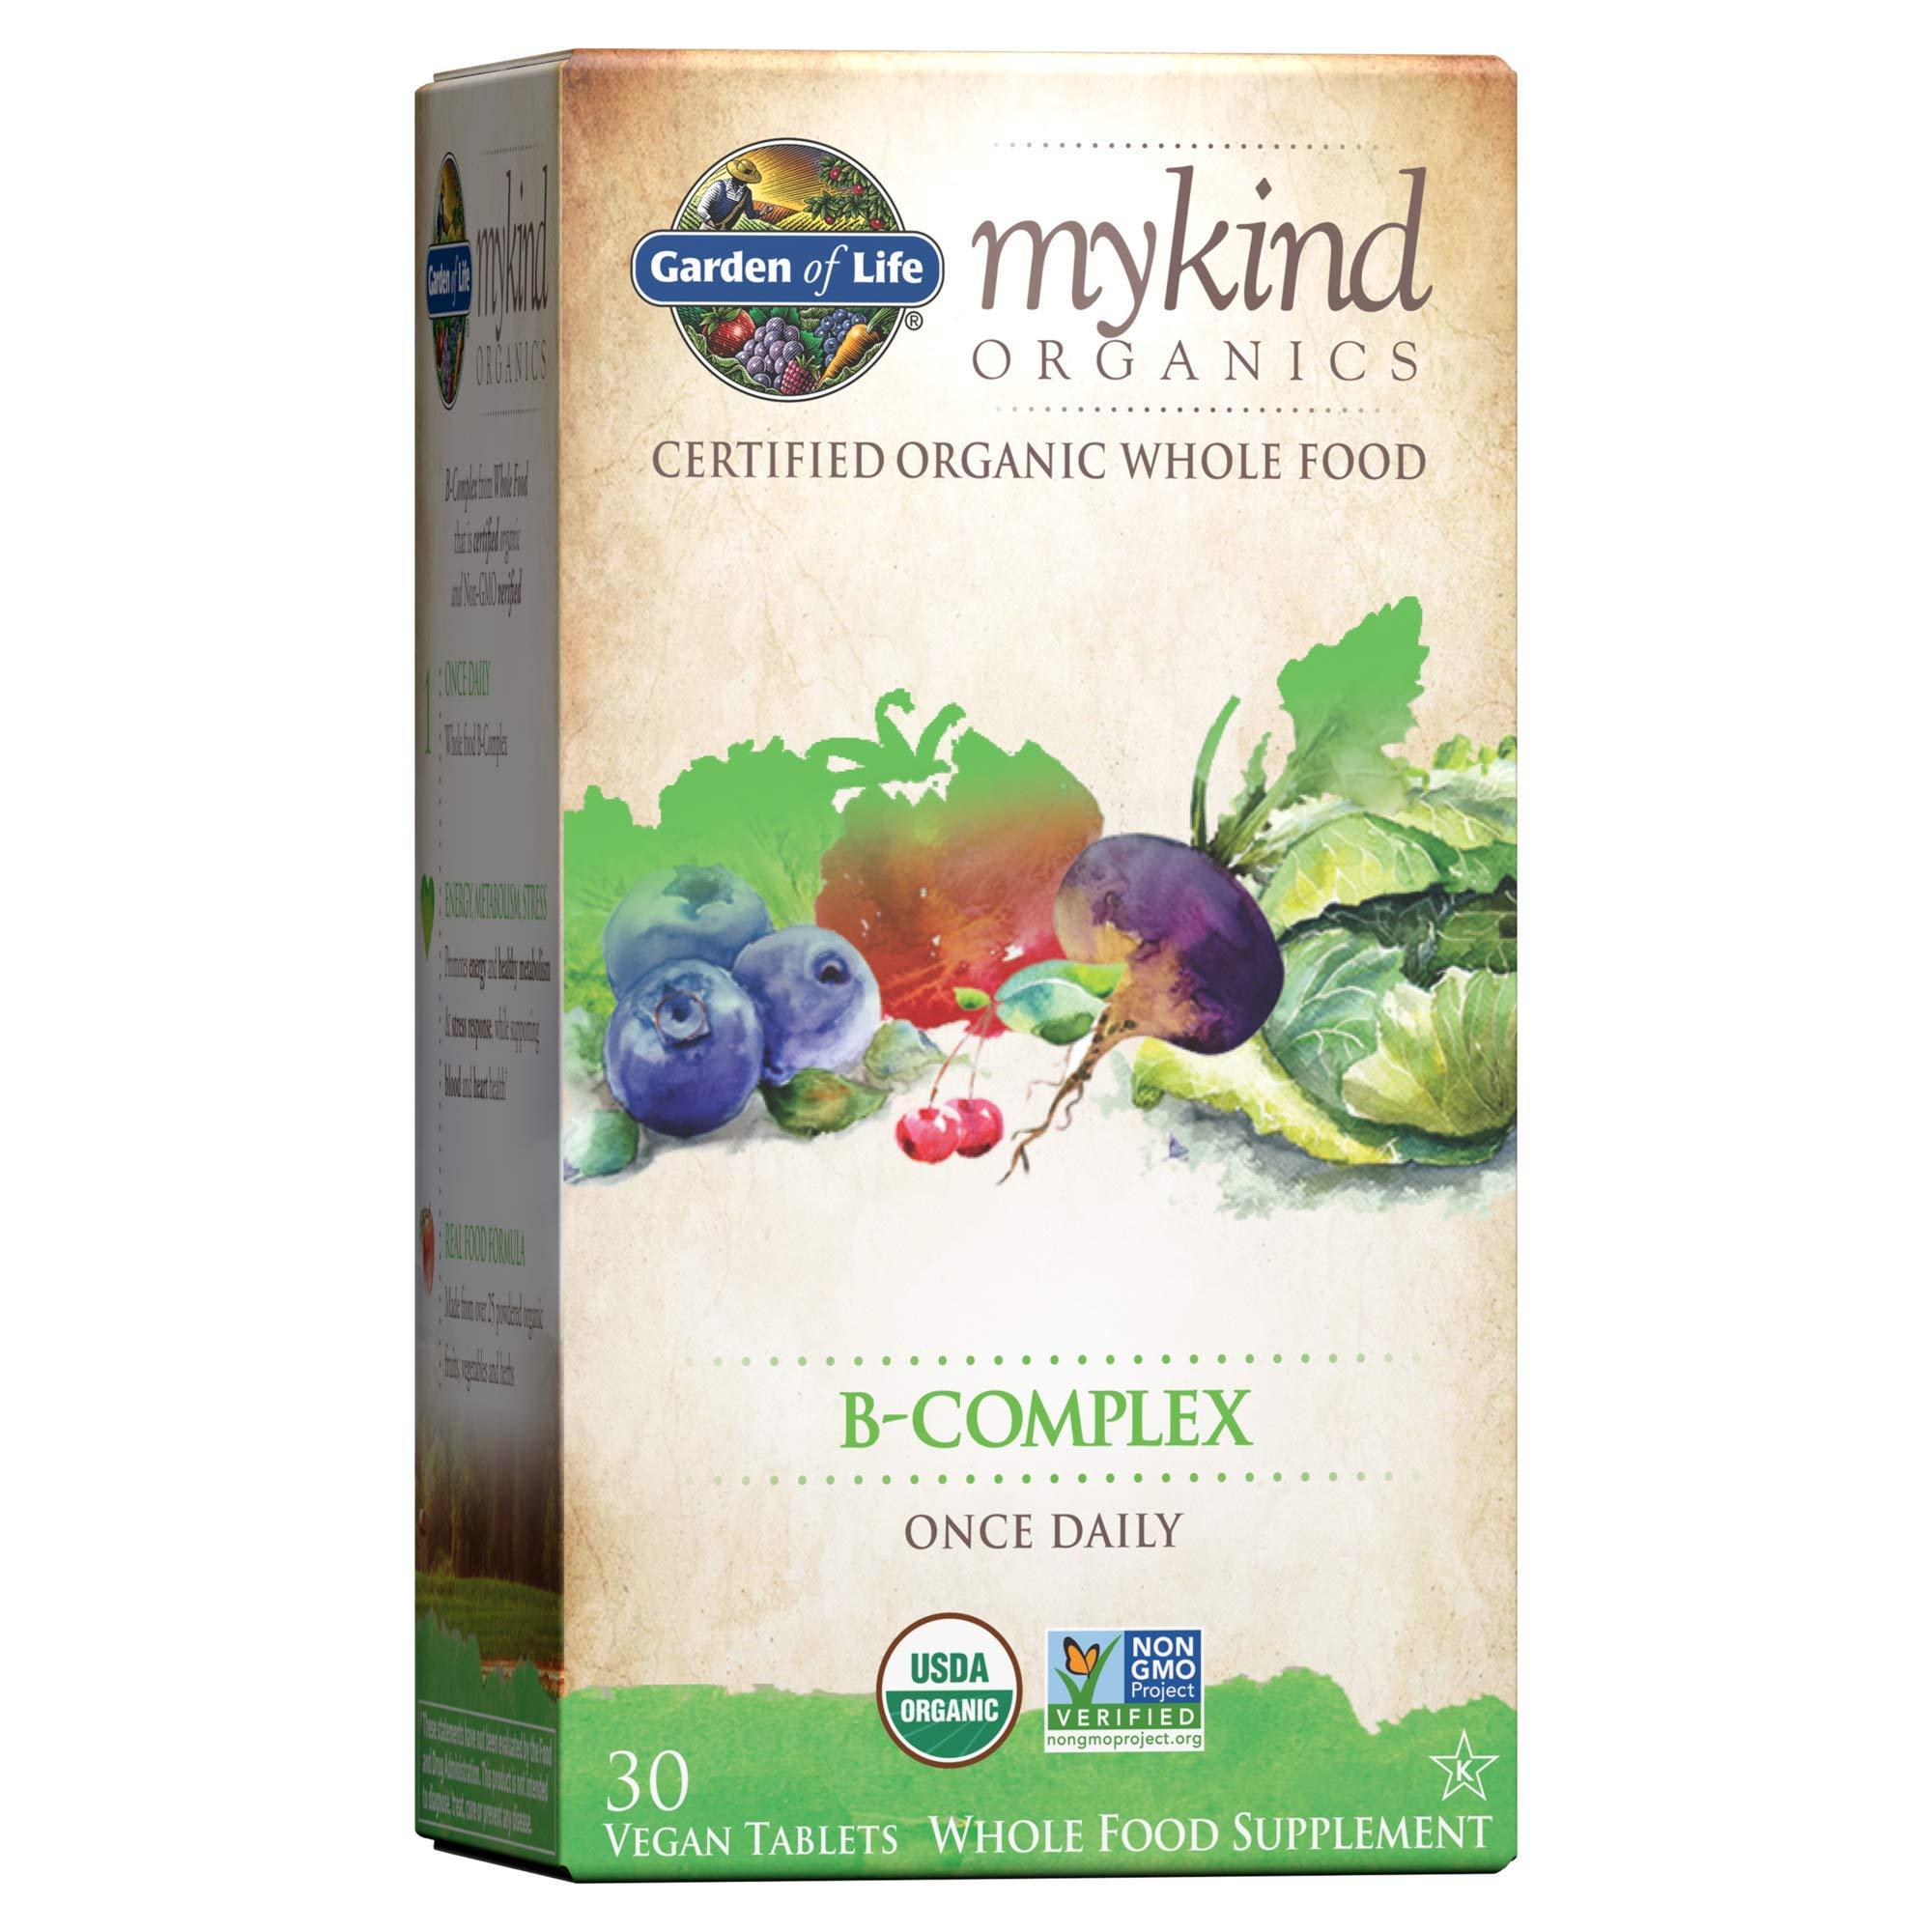 Garden of Life Mykind Organics Vitamin B Complex Once Daily, 30 Tablets, Vegan B Complex Vitamins with Folate, B12, Niacin, B6, Biotin, Organic Whole Food B Complex Supplement for Metabolism, Energy